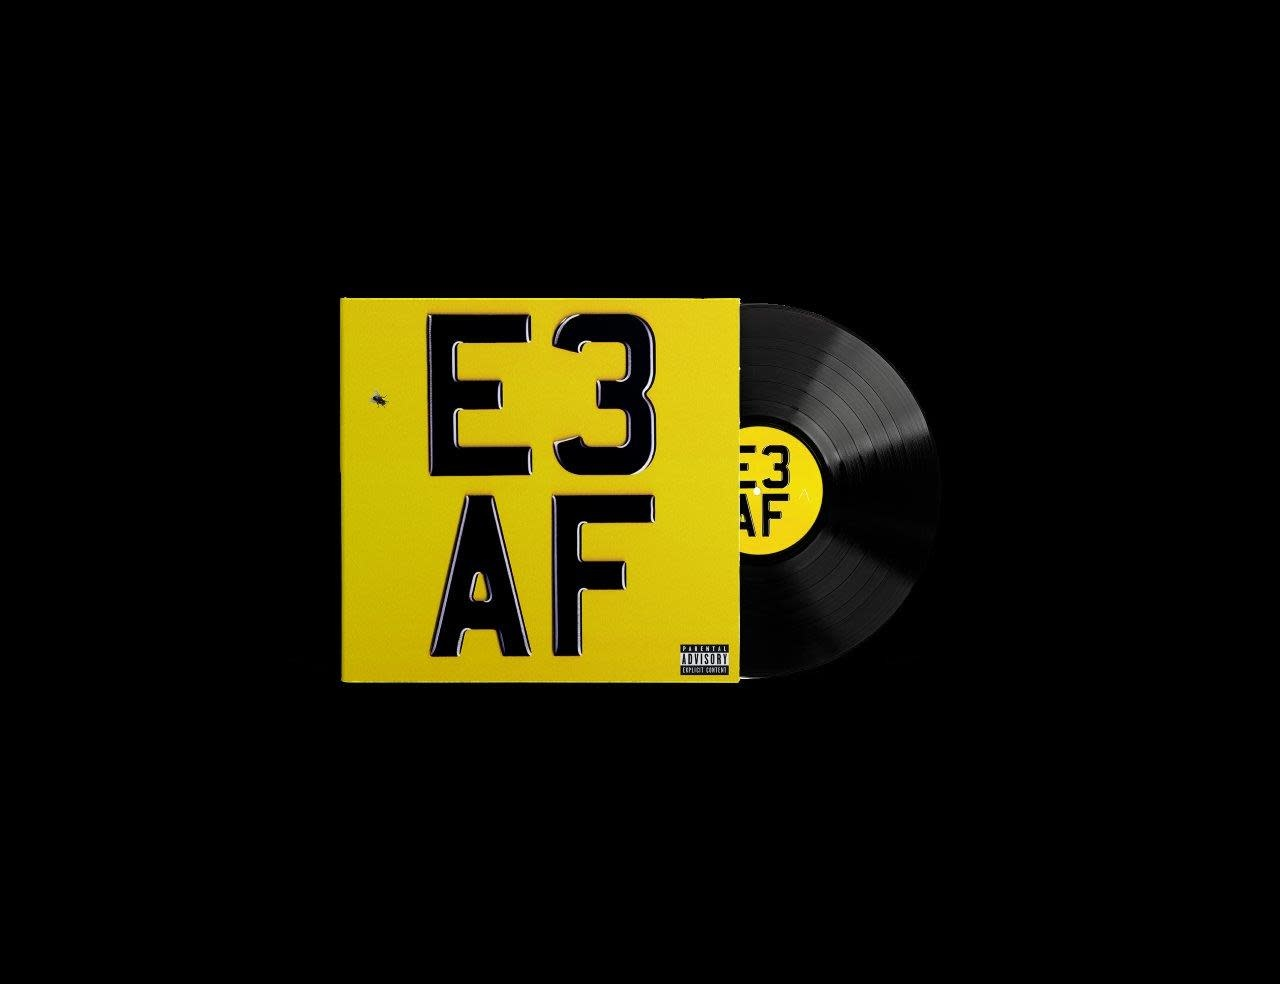 Island Records Dizzee Rascal - E3 AF